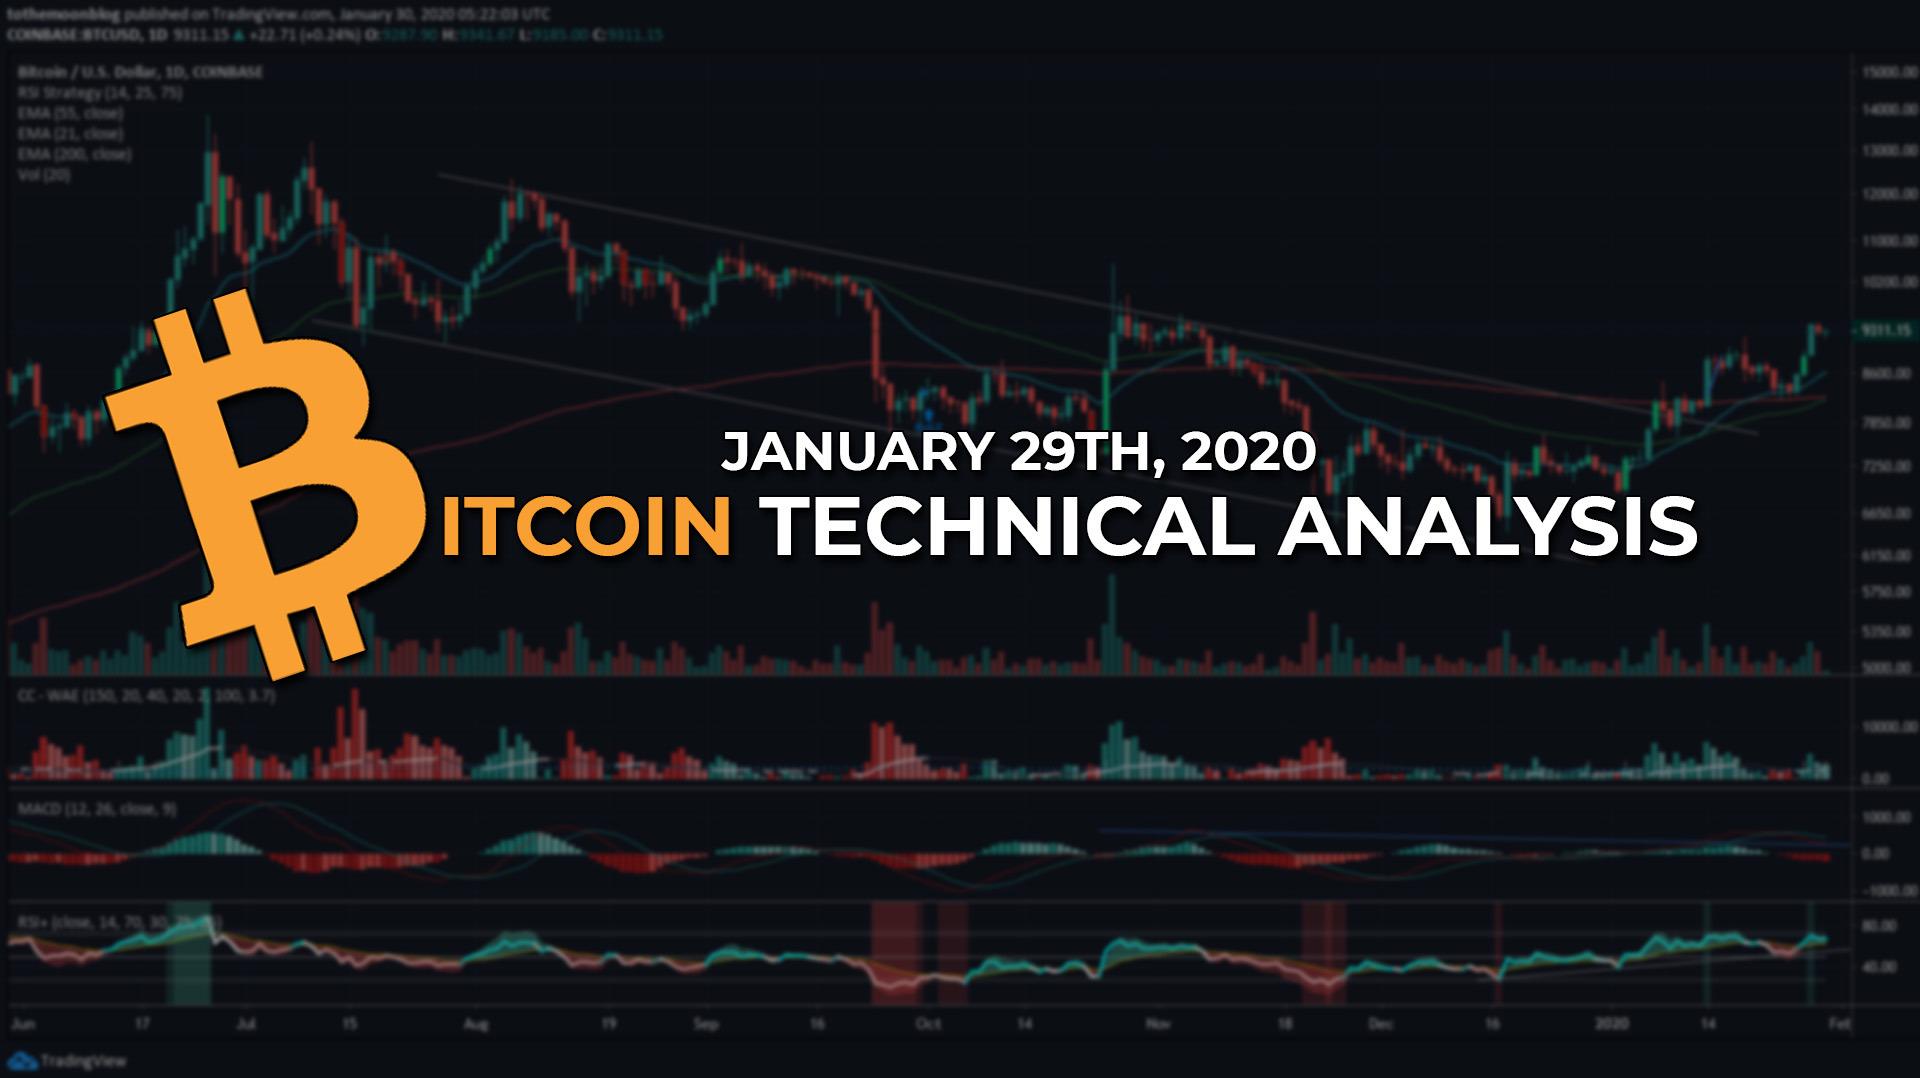 Bitcoin technical analysis for January 29, 2020